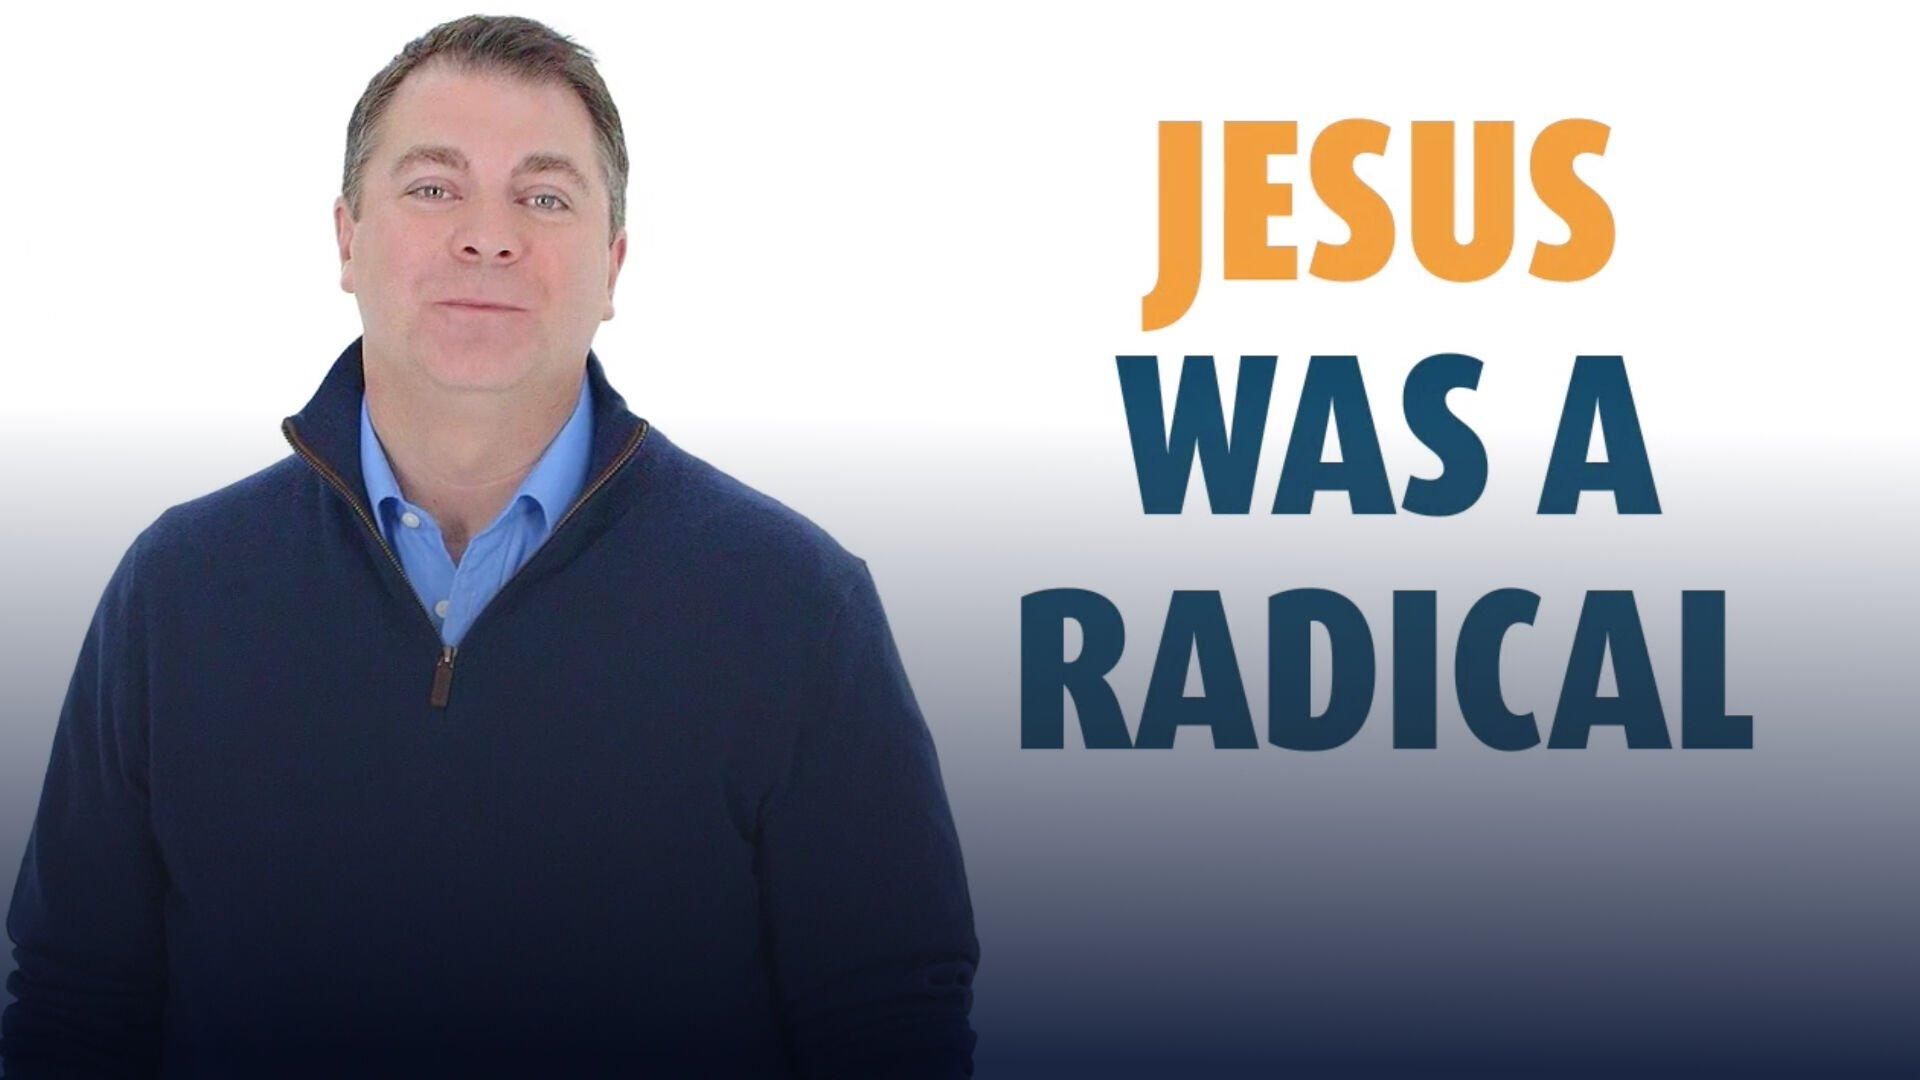 JESUS WAS A RADICAL